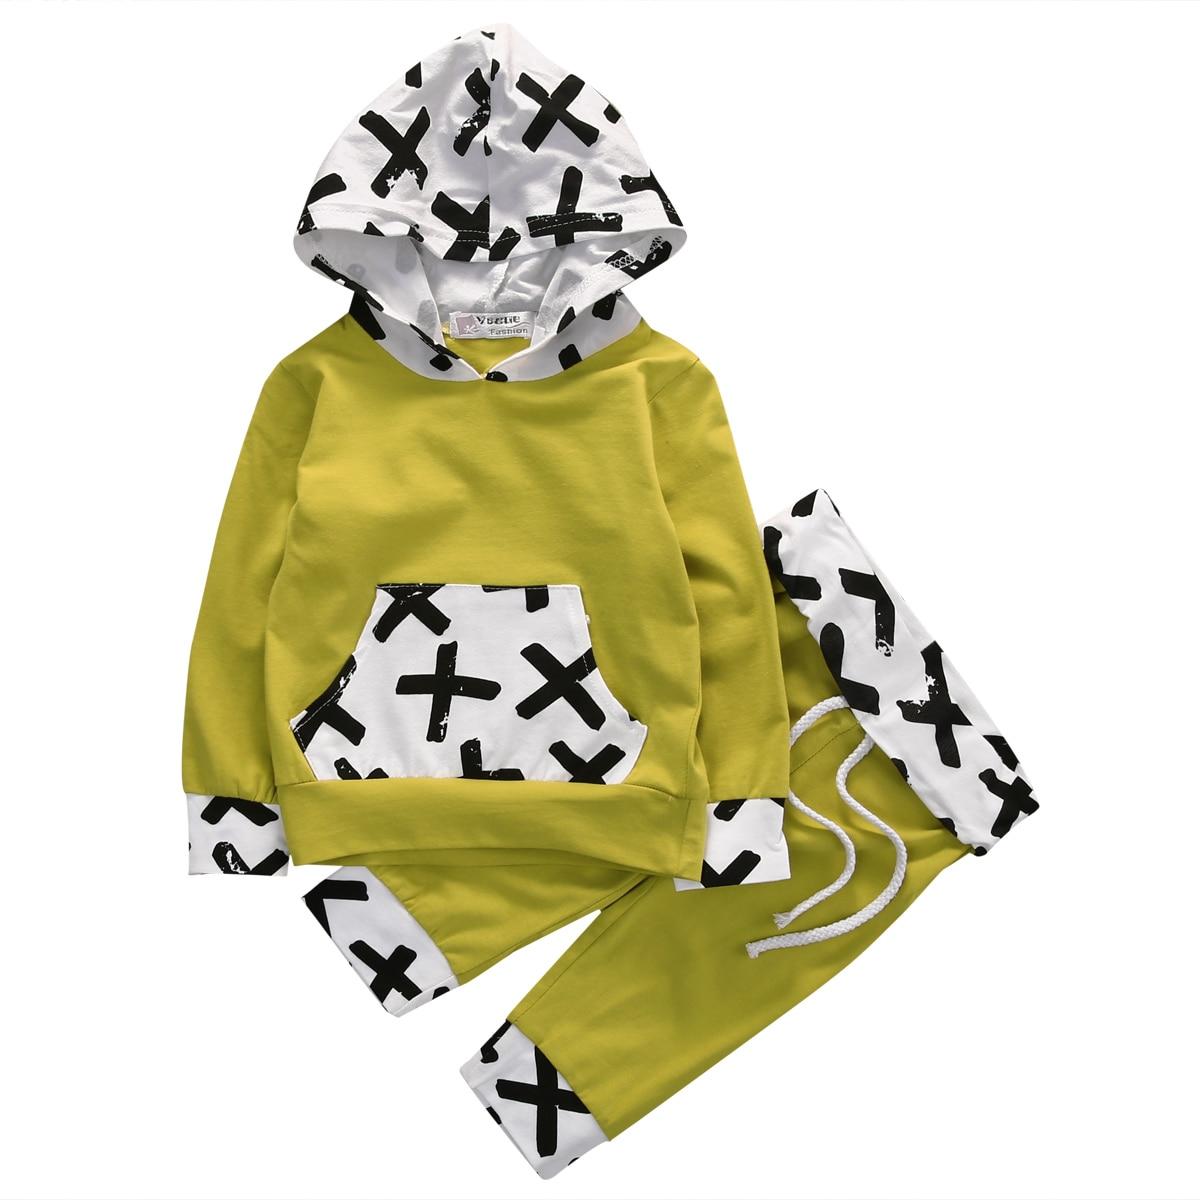 2PCS Kid Baby Boys Sweatshirt Pullover Hooded Coat T-Shirt+Long Pants Cross Yellow Set Clothes Outfit